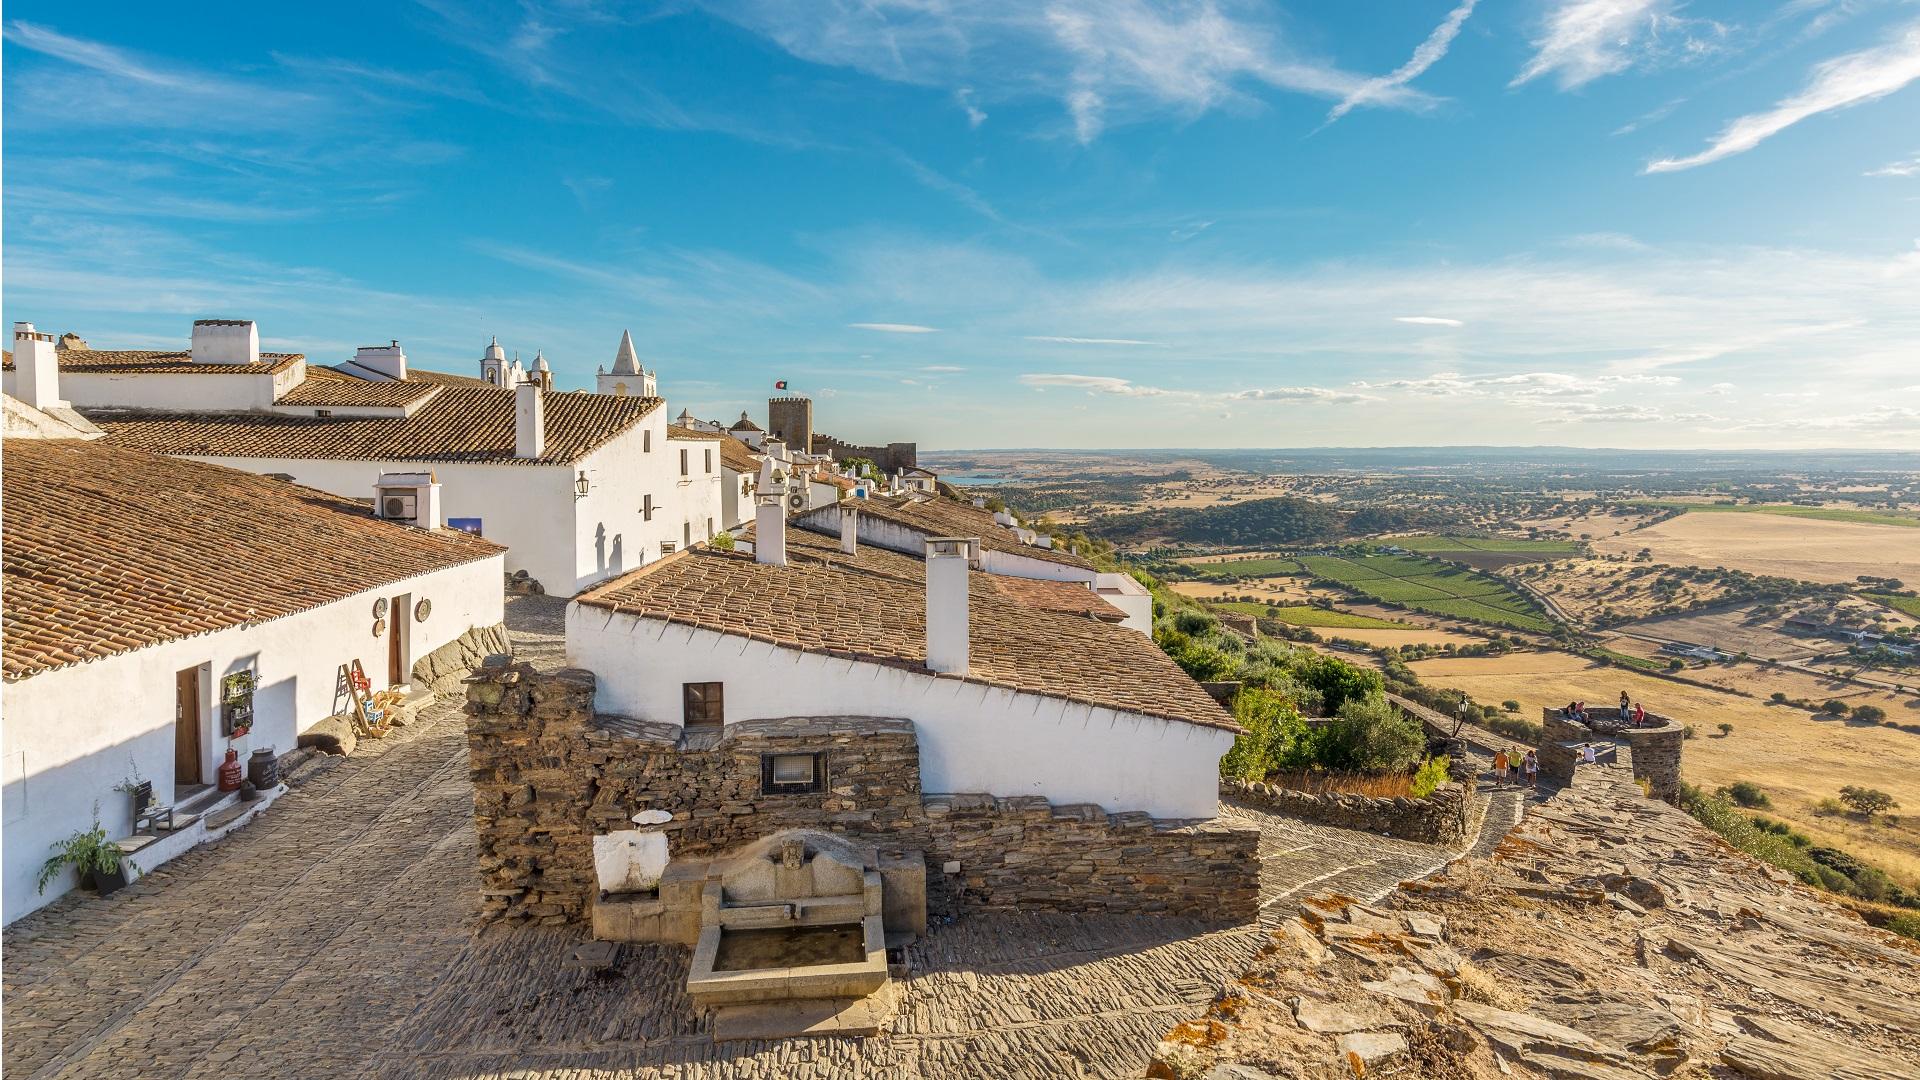 Het dorpje Monsaraz in de Alentejo, Portugal